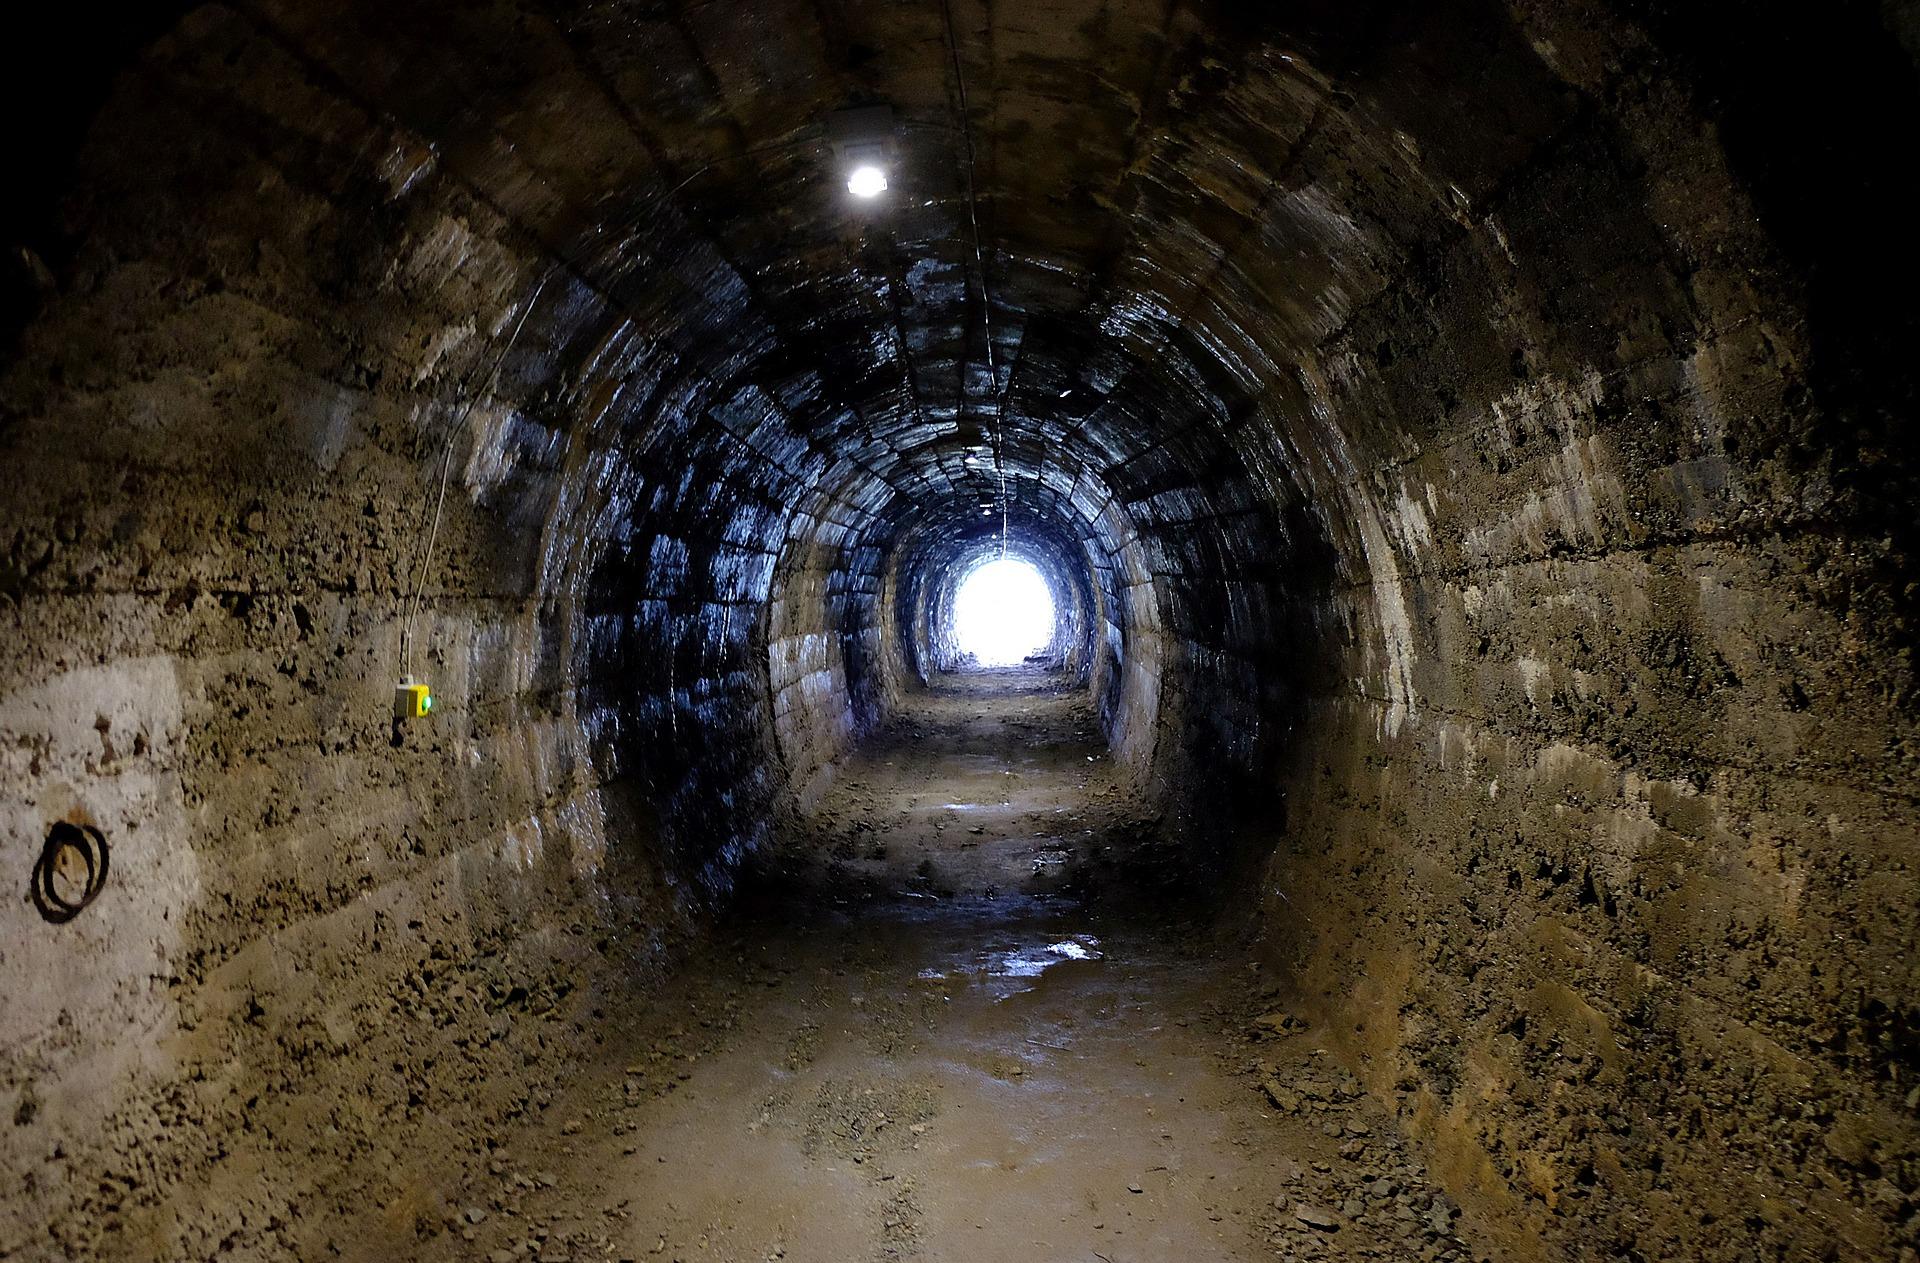 tunnel-2203491_1920.jpg